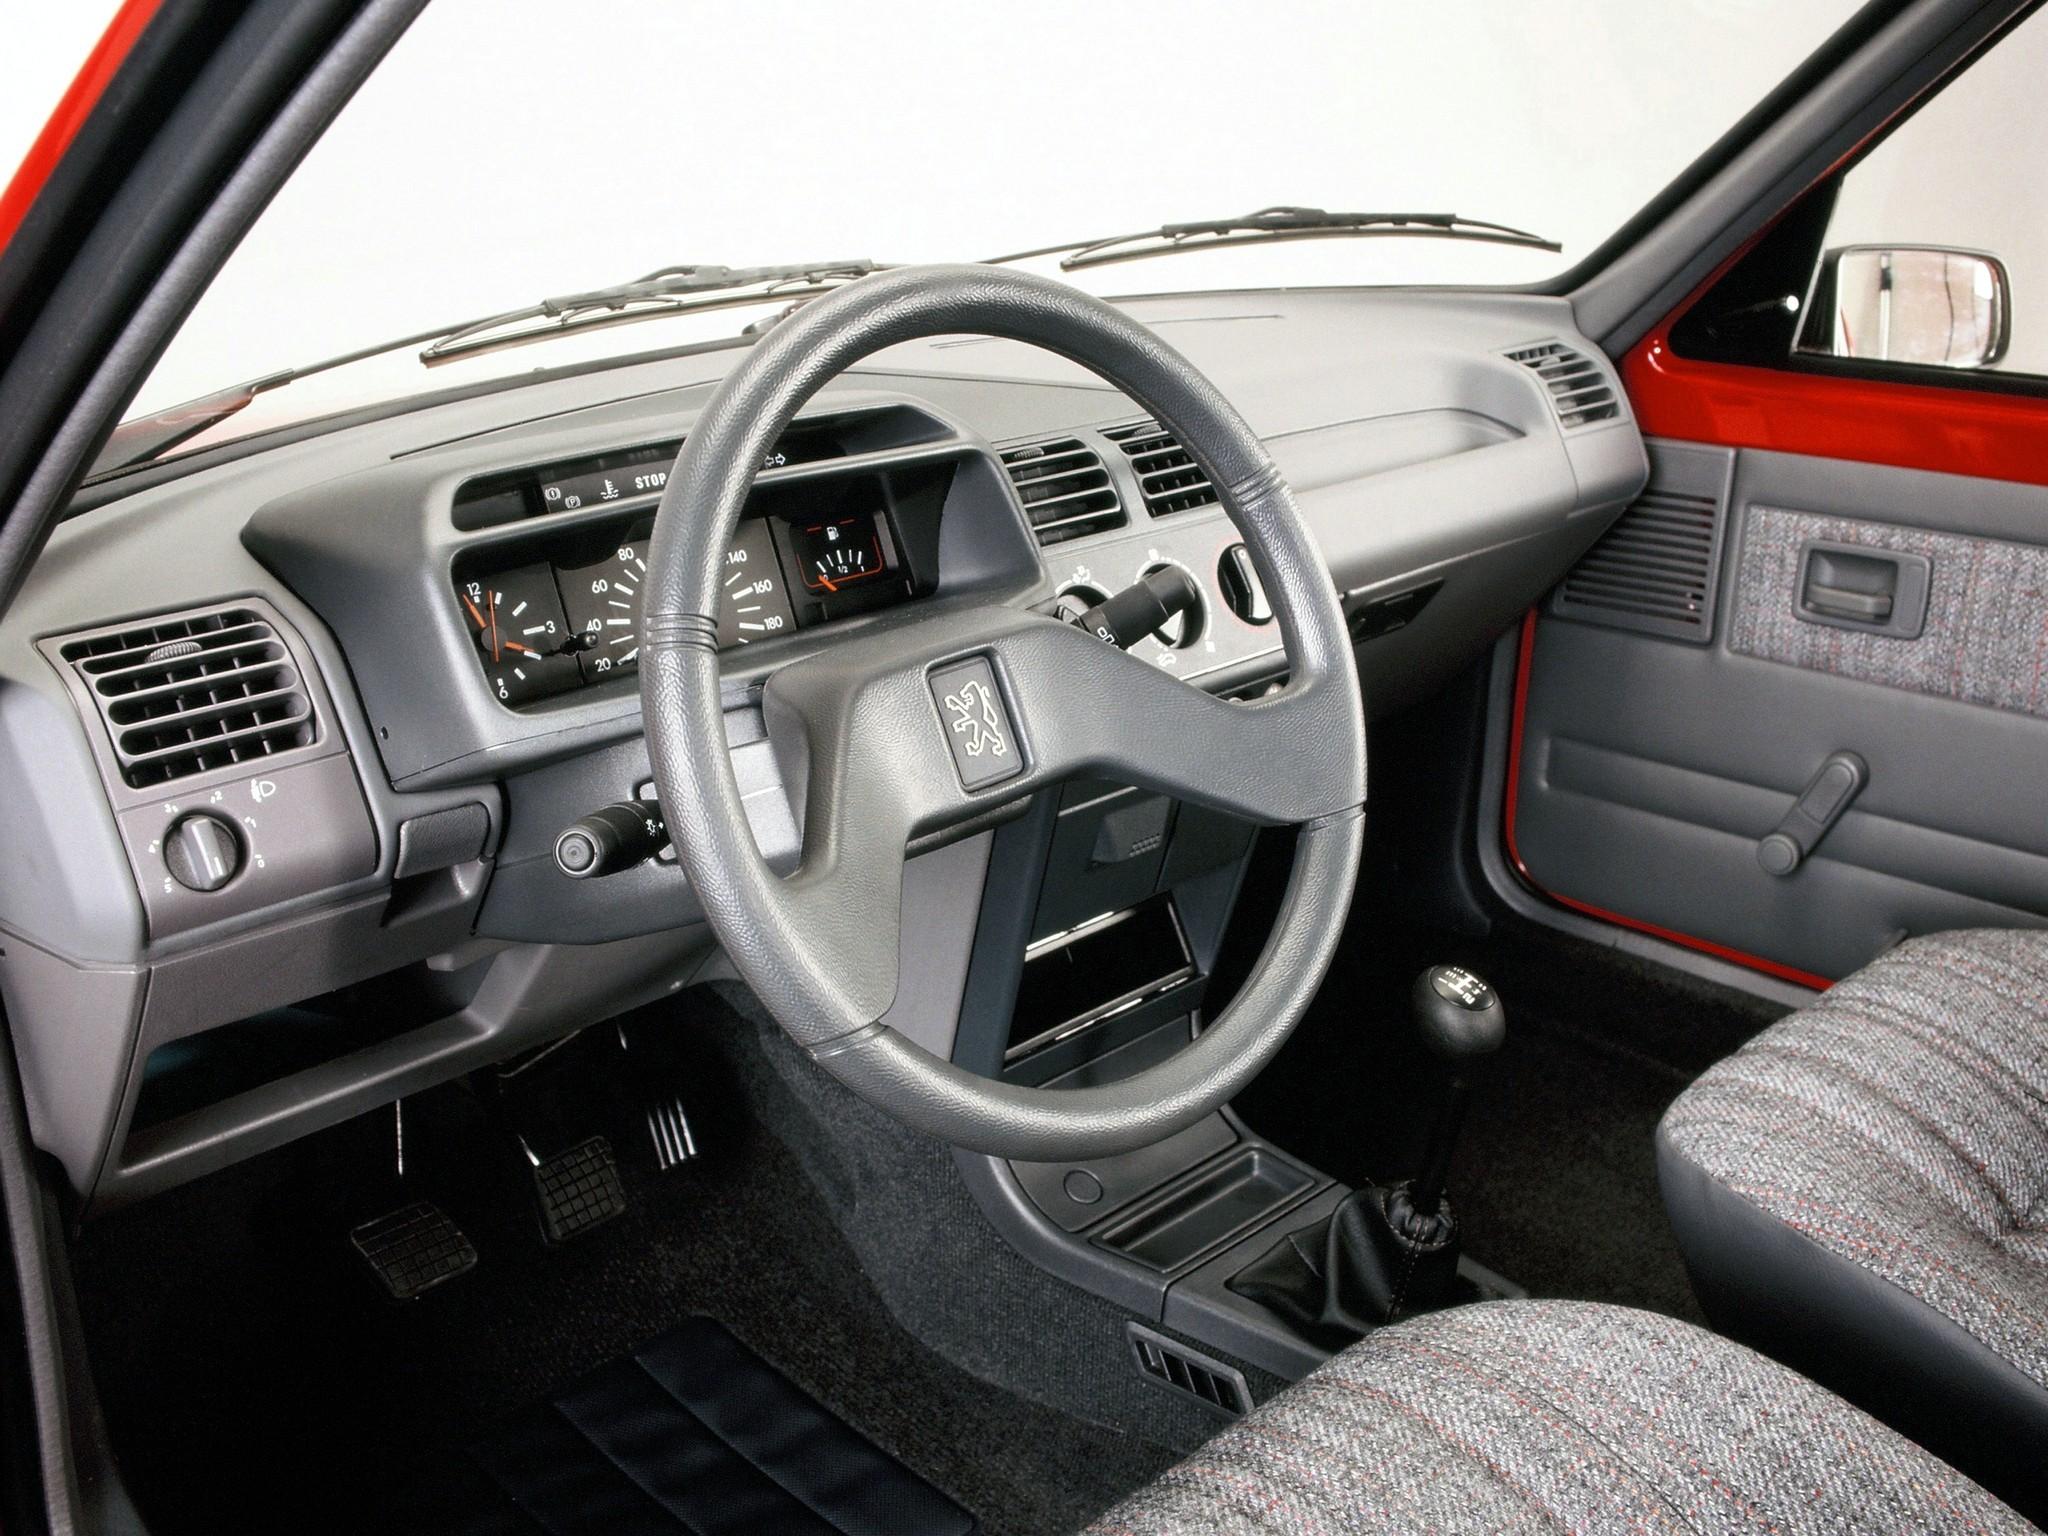 Peugeot 205 3 Doors Specs Amp Photos 1984 1985 1986